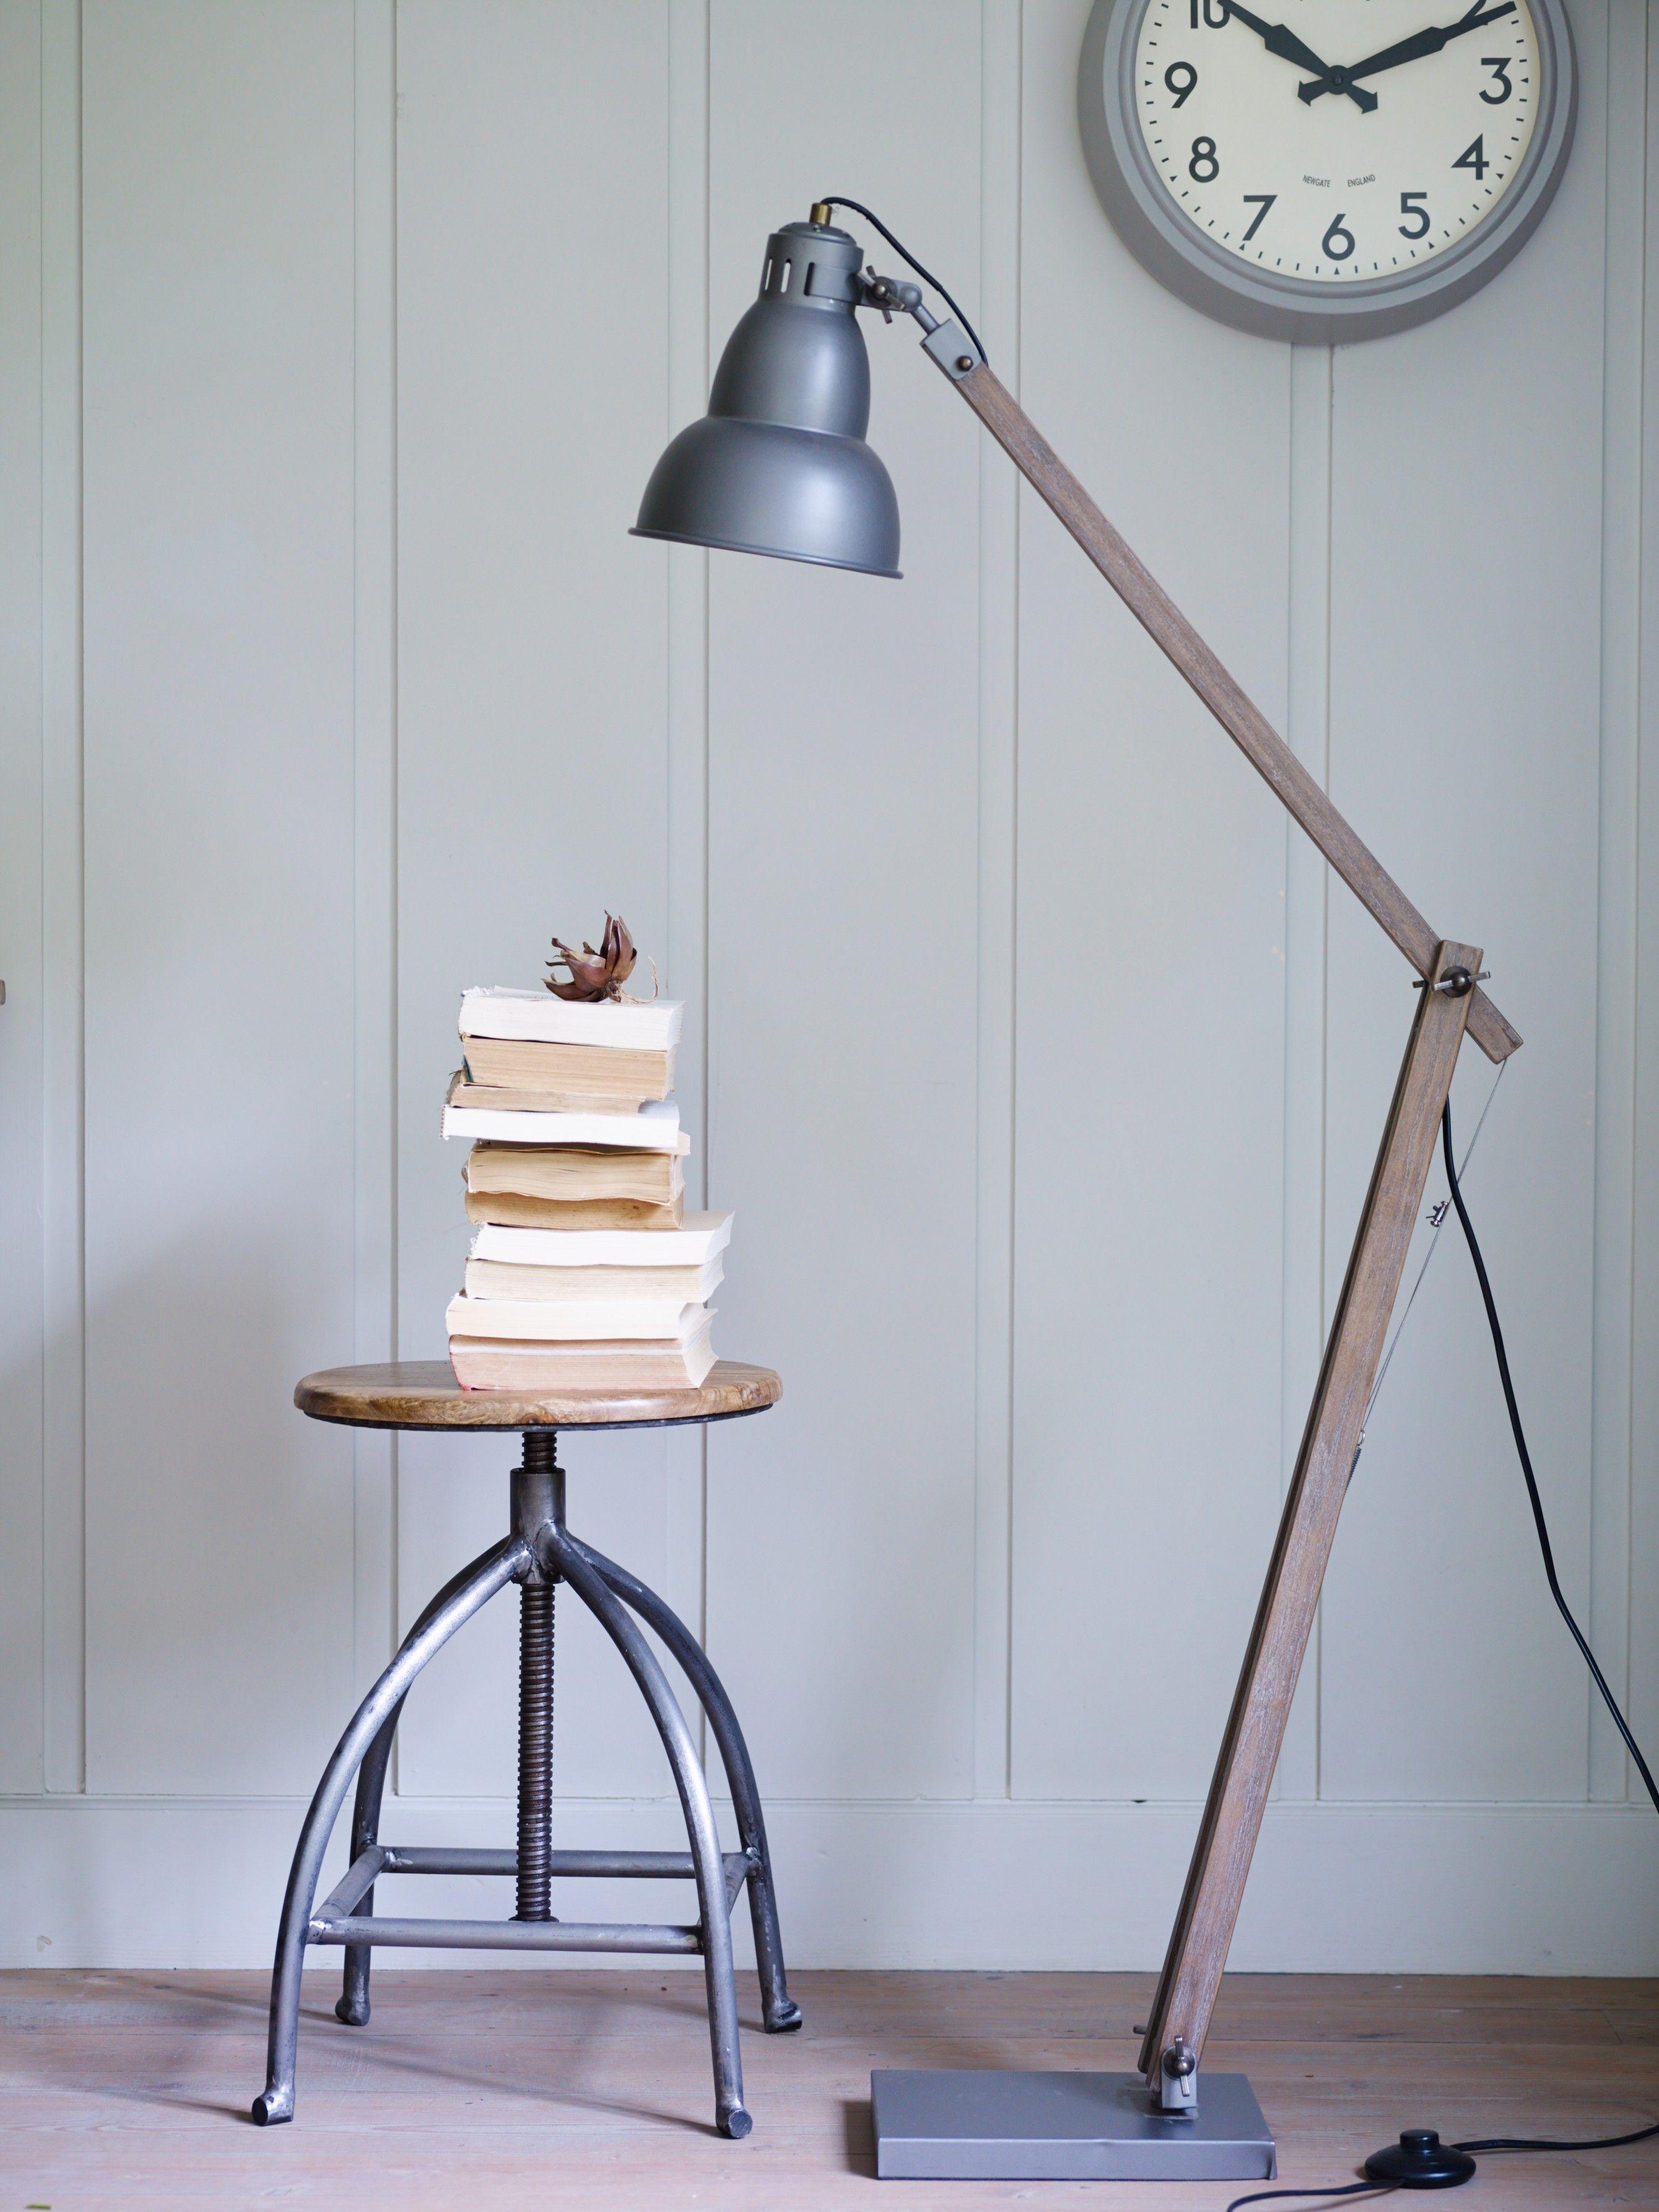 of treasures floors floor life lamp vintage img little